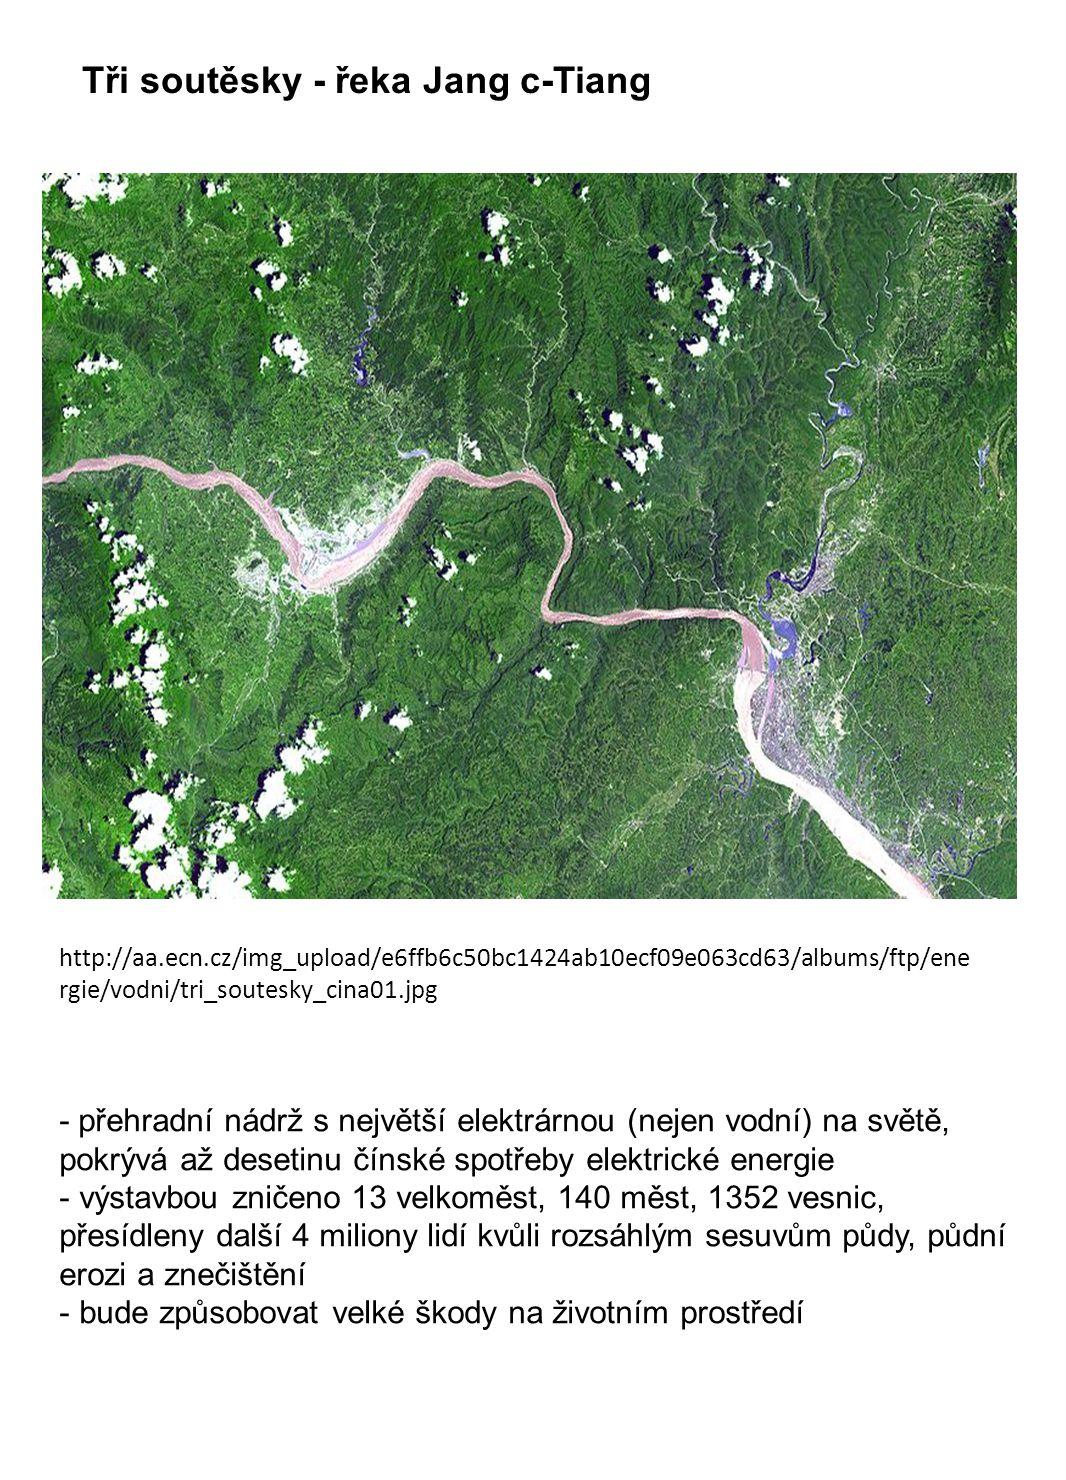 Tři soutěsky - řeka Jang c-Tiang